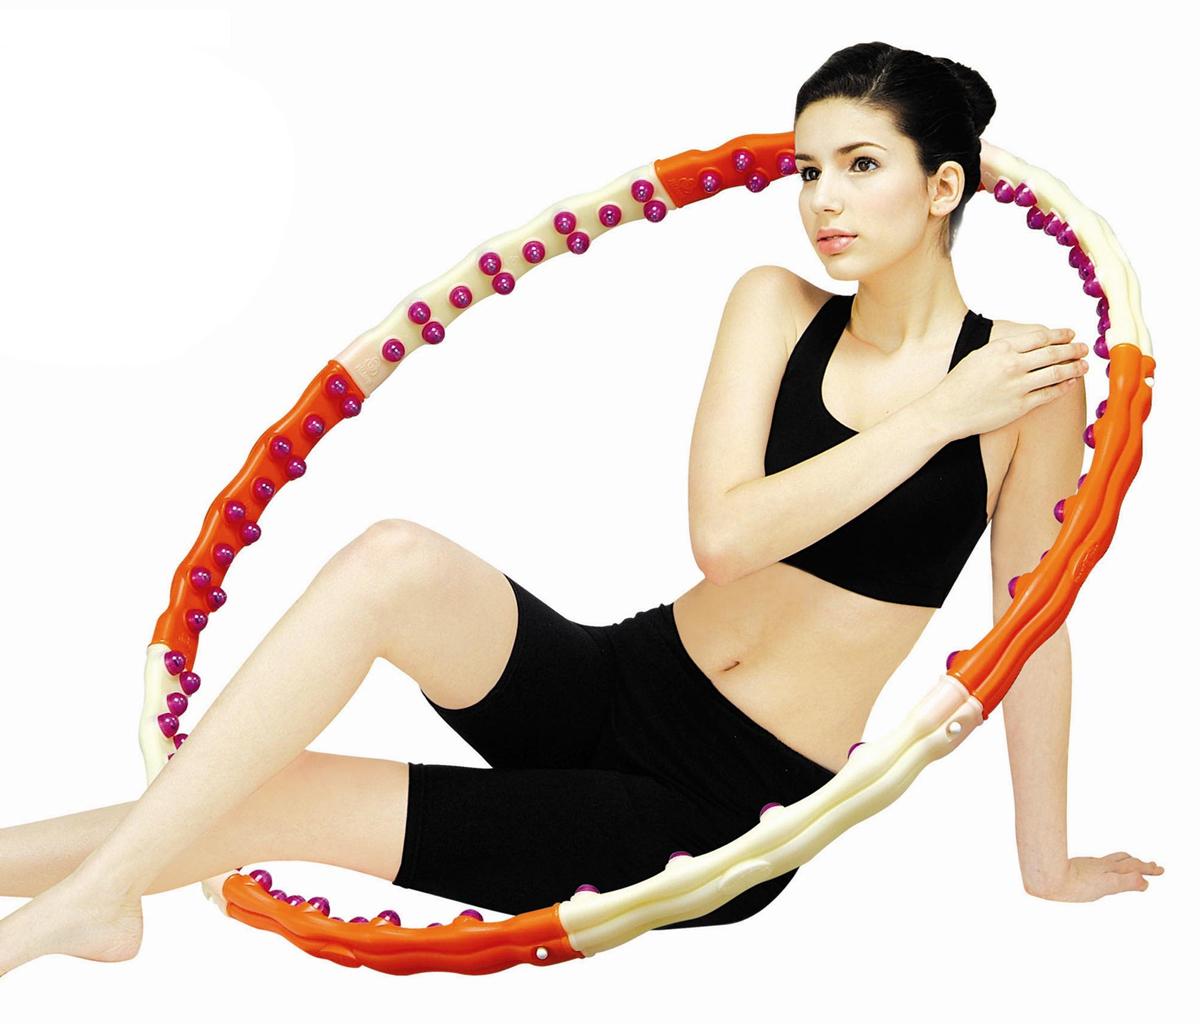 massage fitness hoelahoep jemimah 1 7 kg hoelahoepwinkel nlmassagehoelahoep jemimah 1 7 kg